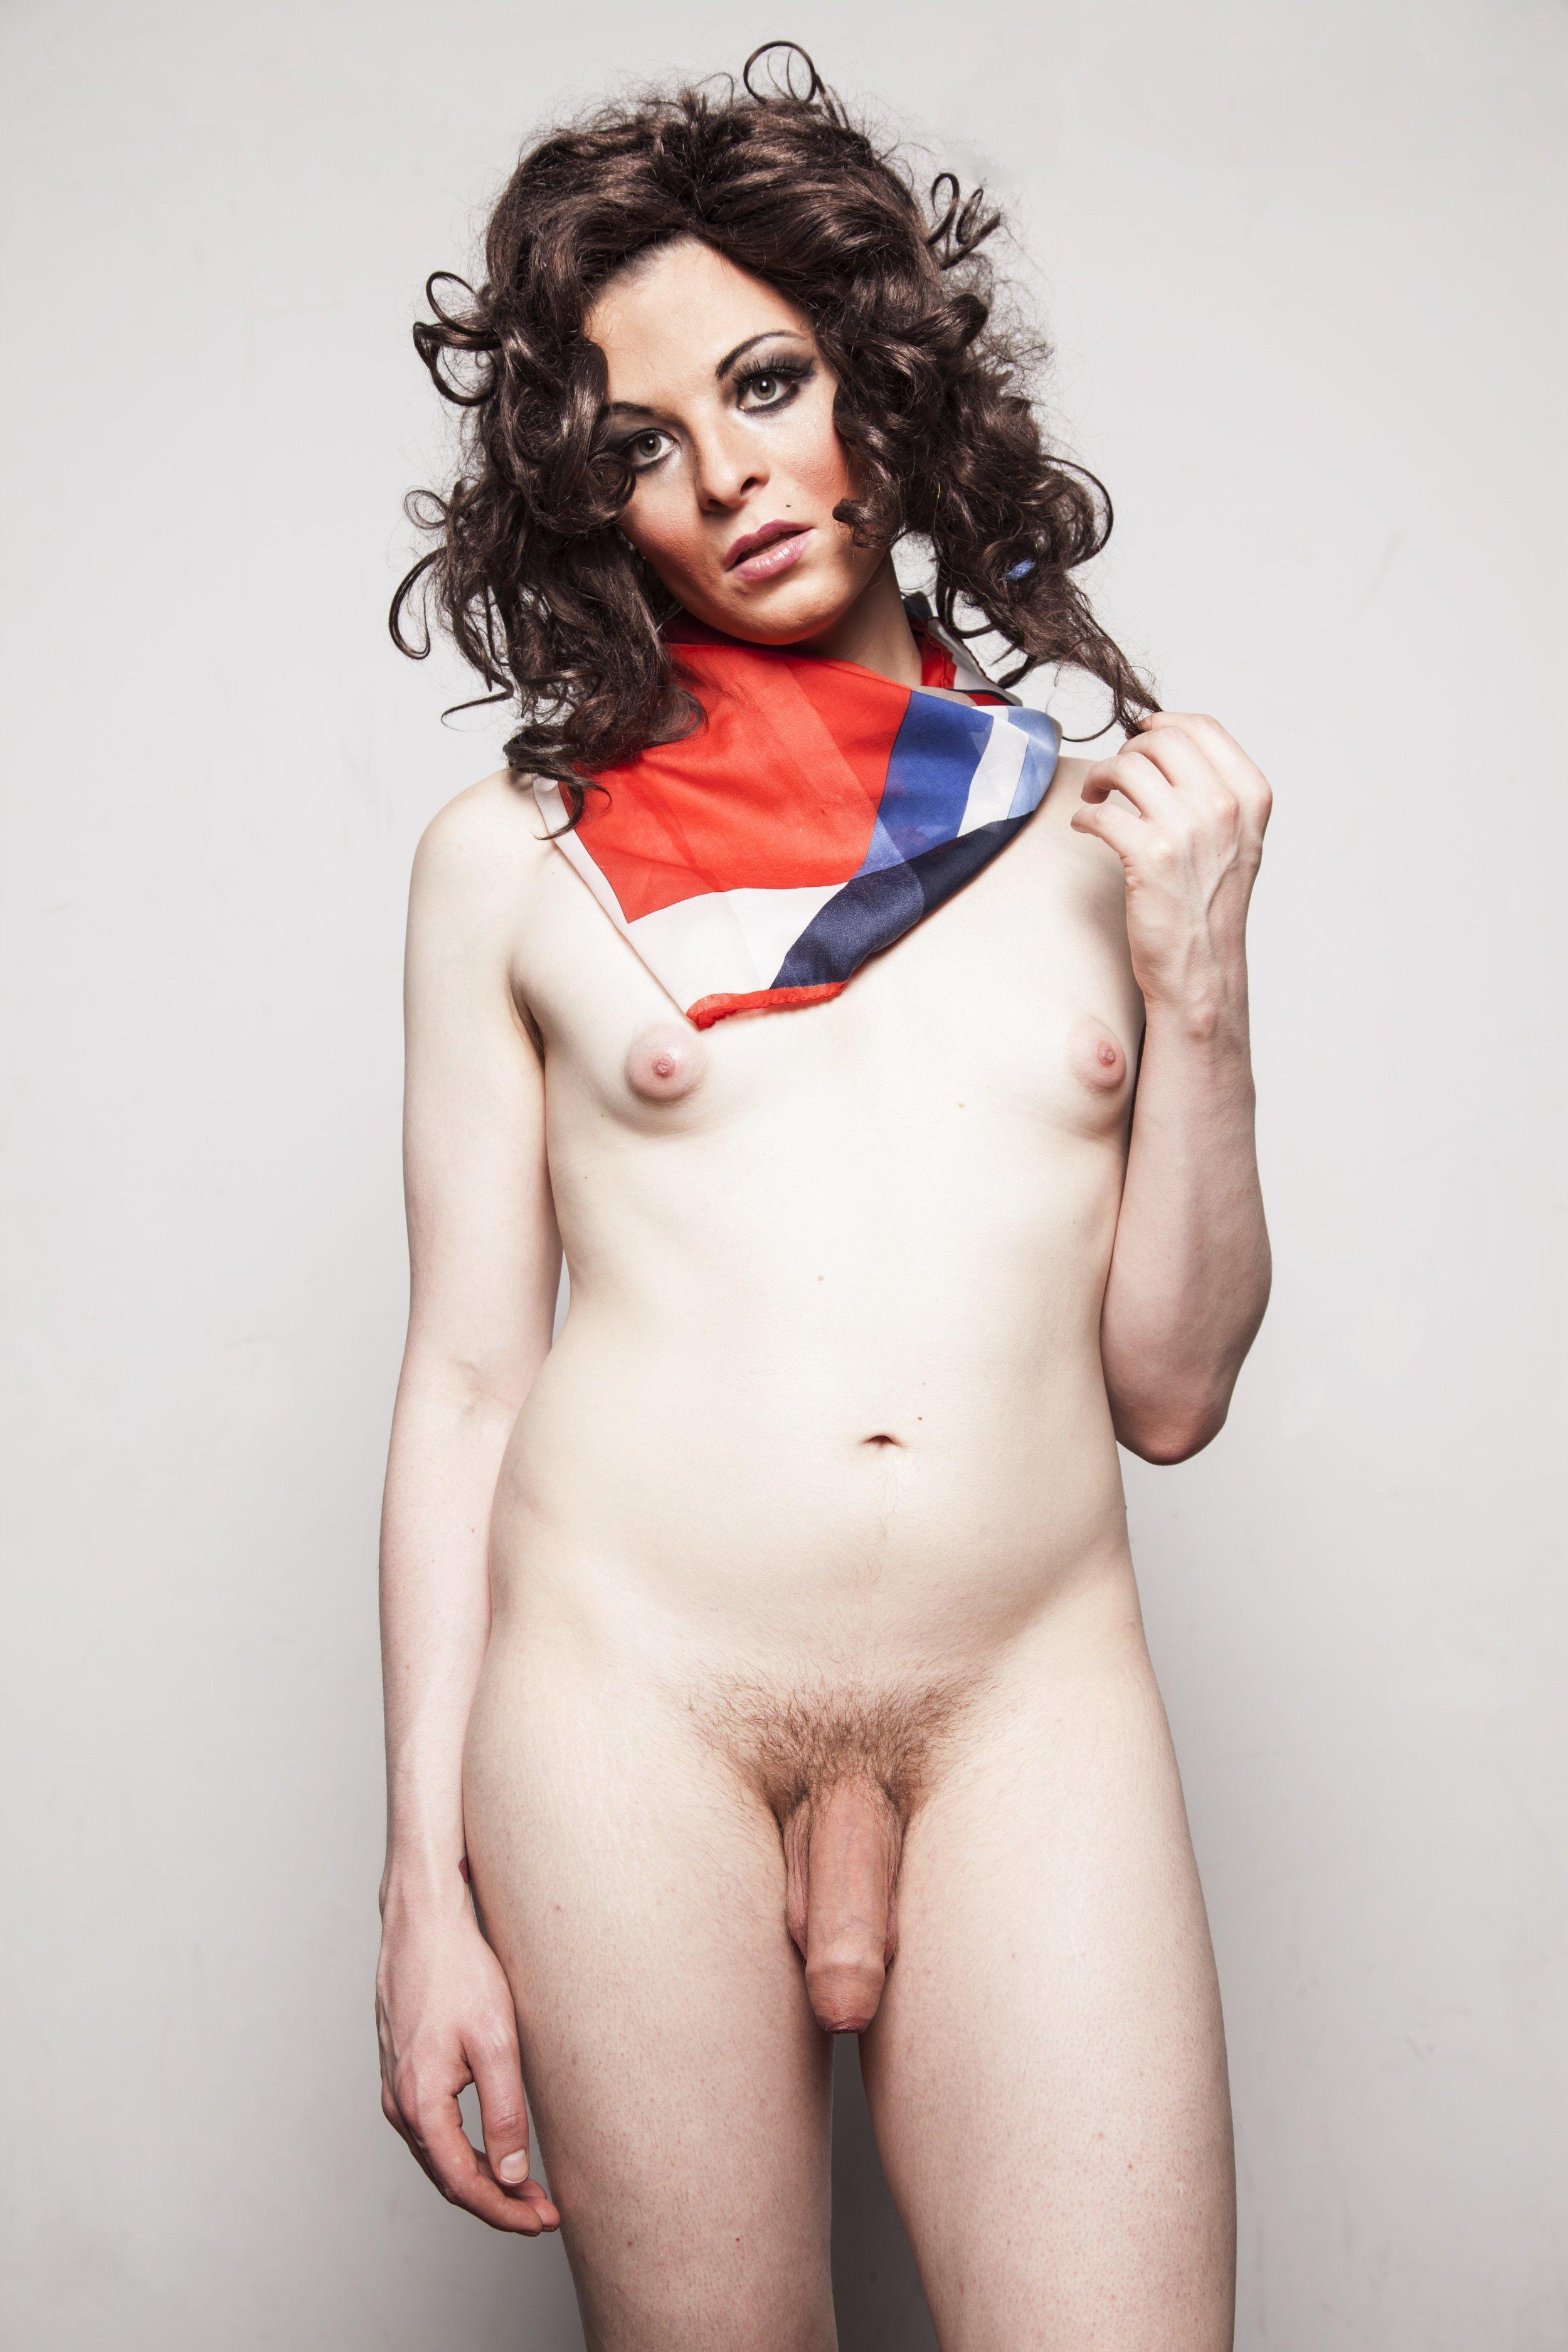 BRUCE LABRUCE (1964)  Transwoman with scarf,  2012, fotografía impresión digital, 61 x 43